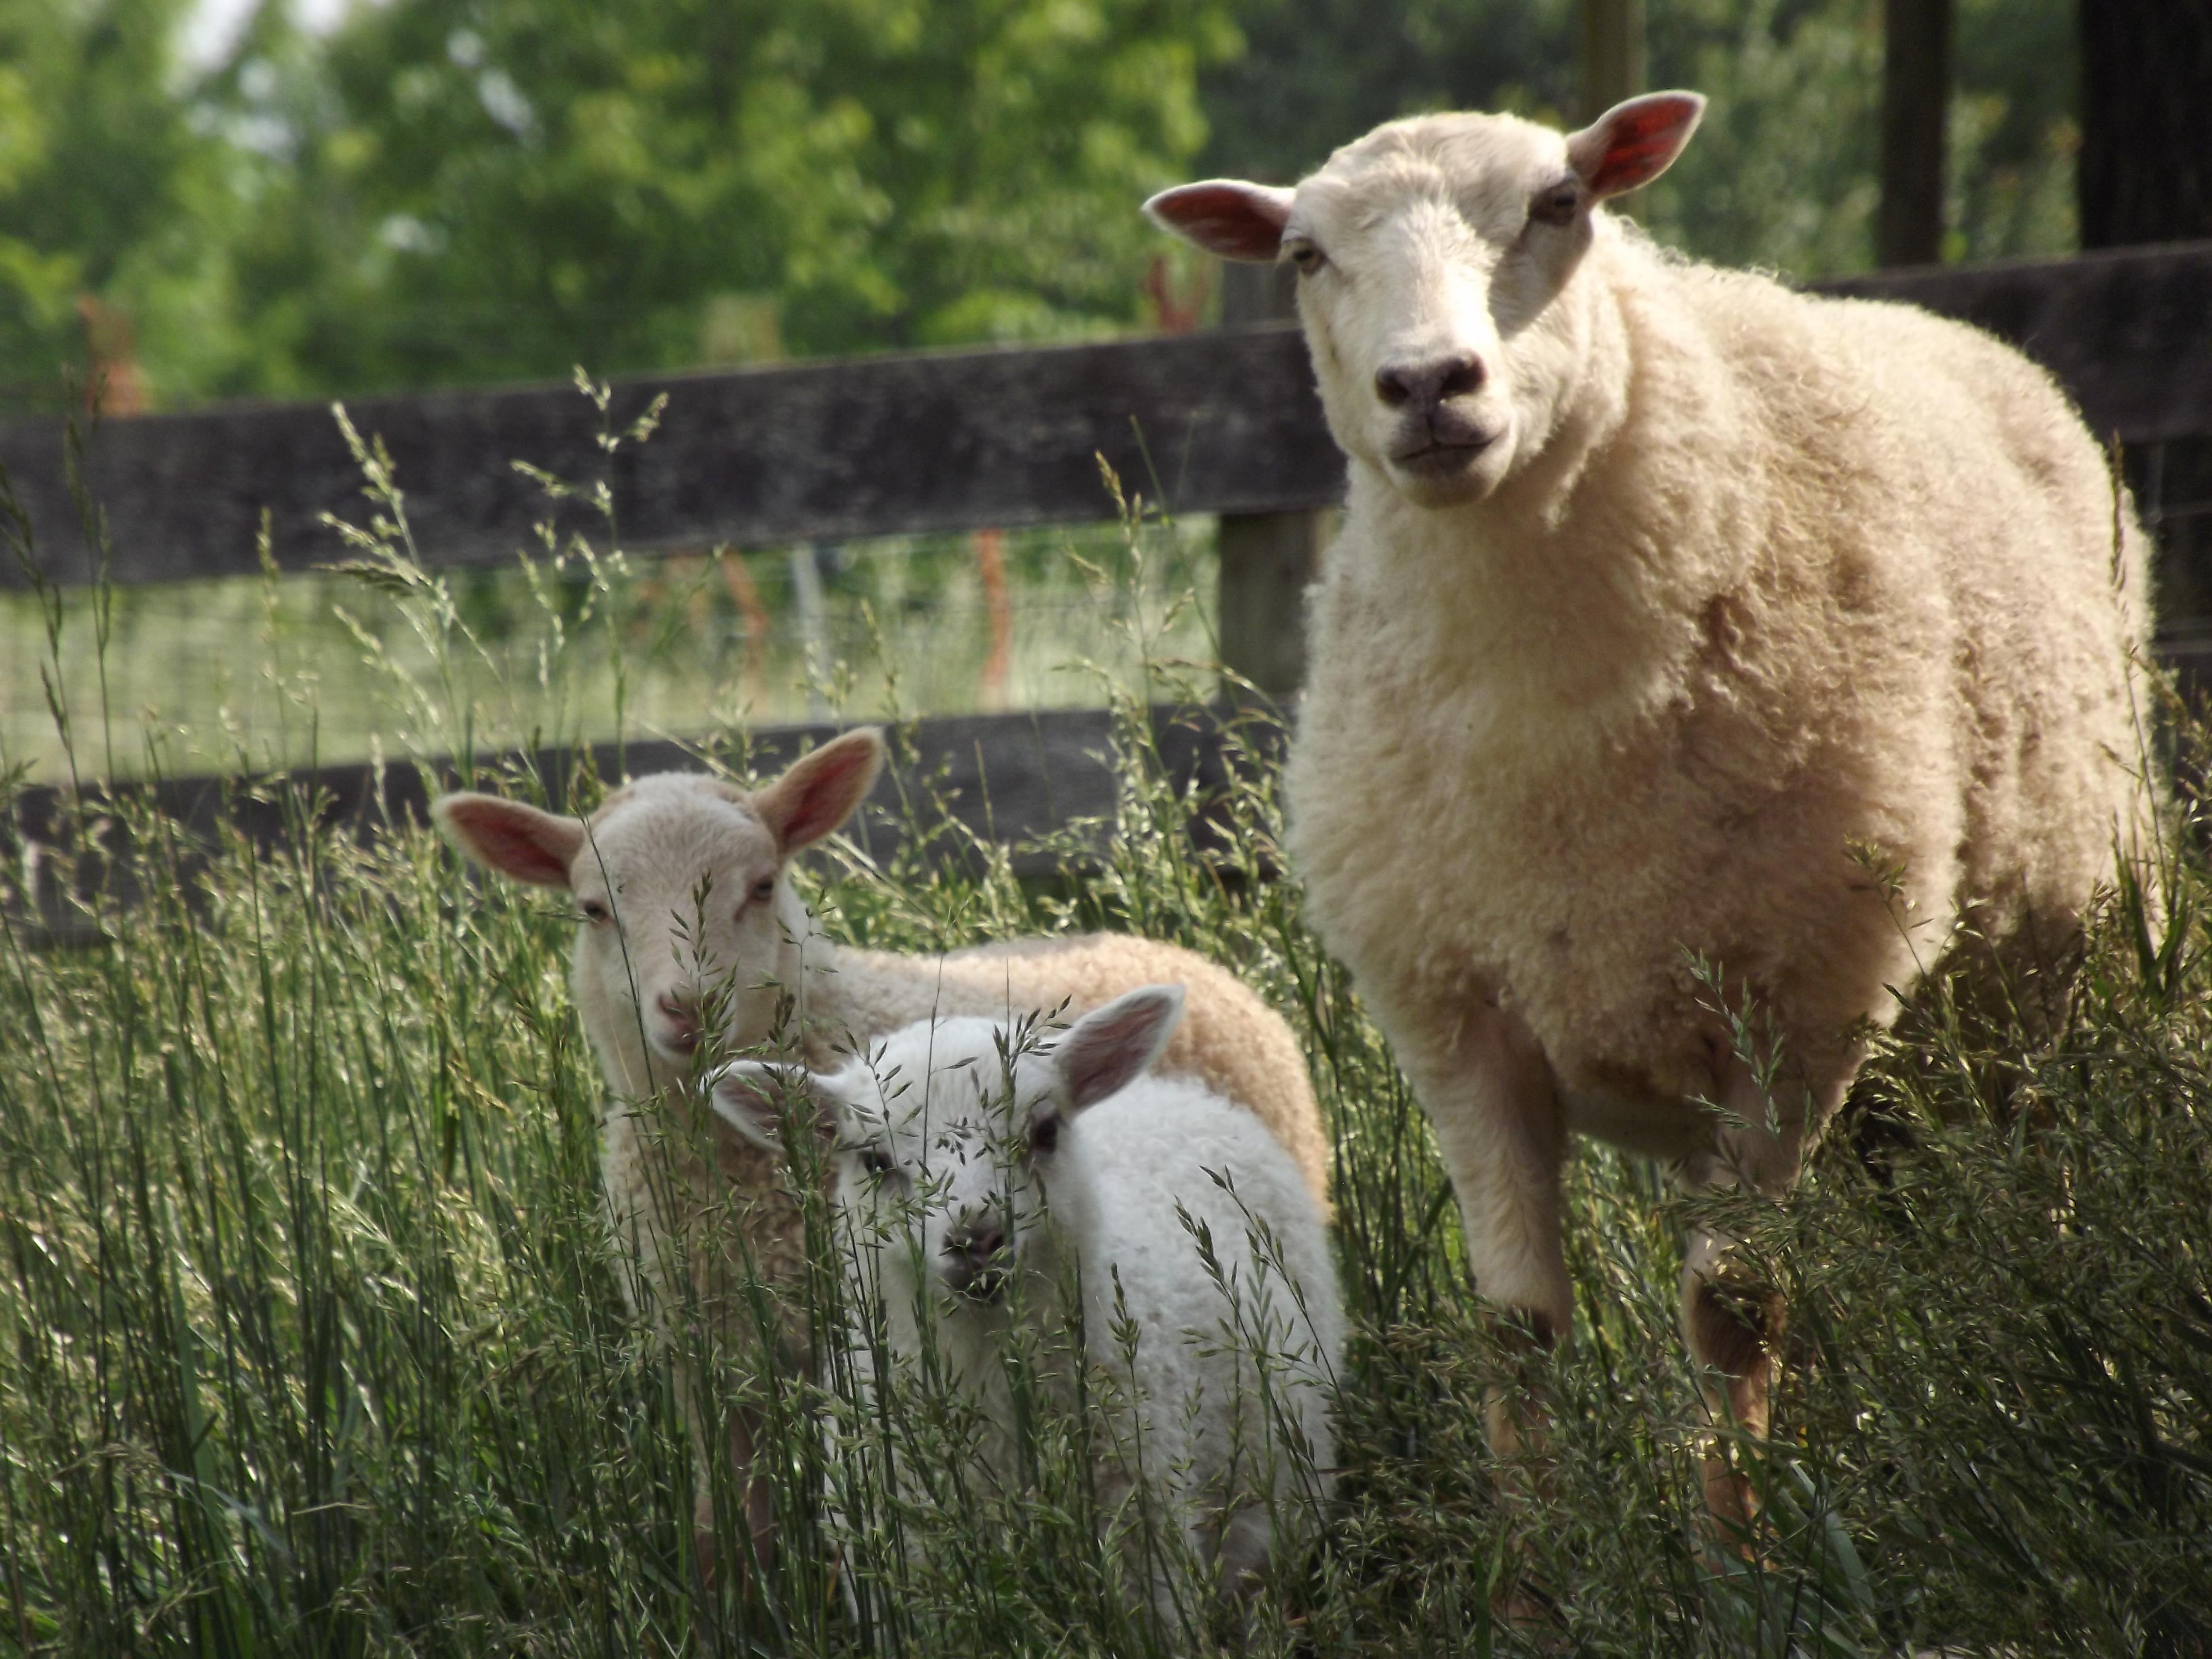 Gwyneth and her lambs